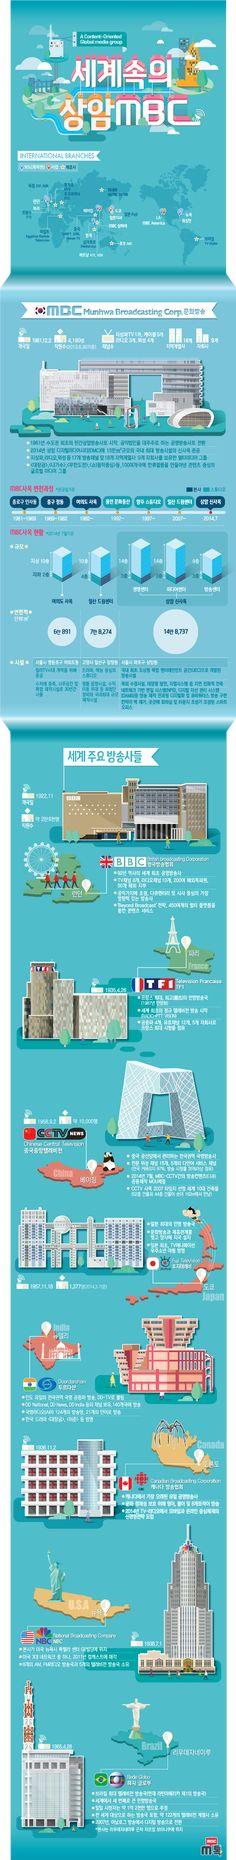 "Korean website – MBC 문화방송 공식 블로그 M톡 :: [인포그래픽으로 보는 MBC 신사옥] ""세계 속의 MBC, 미래를 엽니다"" Information Design, Information Graphics, Keynote Design, Desing Inspiration, Korea Design, Design Presentation, Web Design, Leaflet Design, Promotional Design"